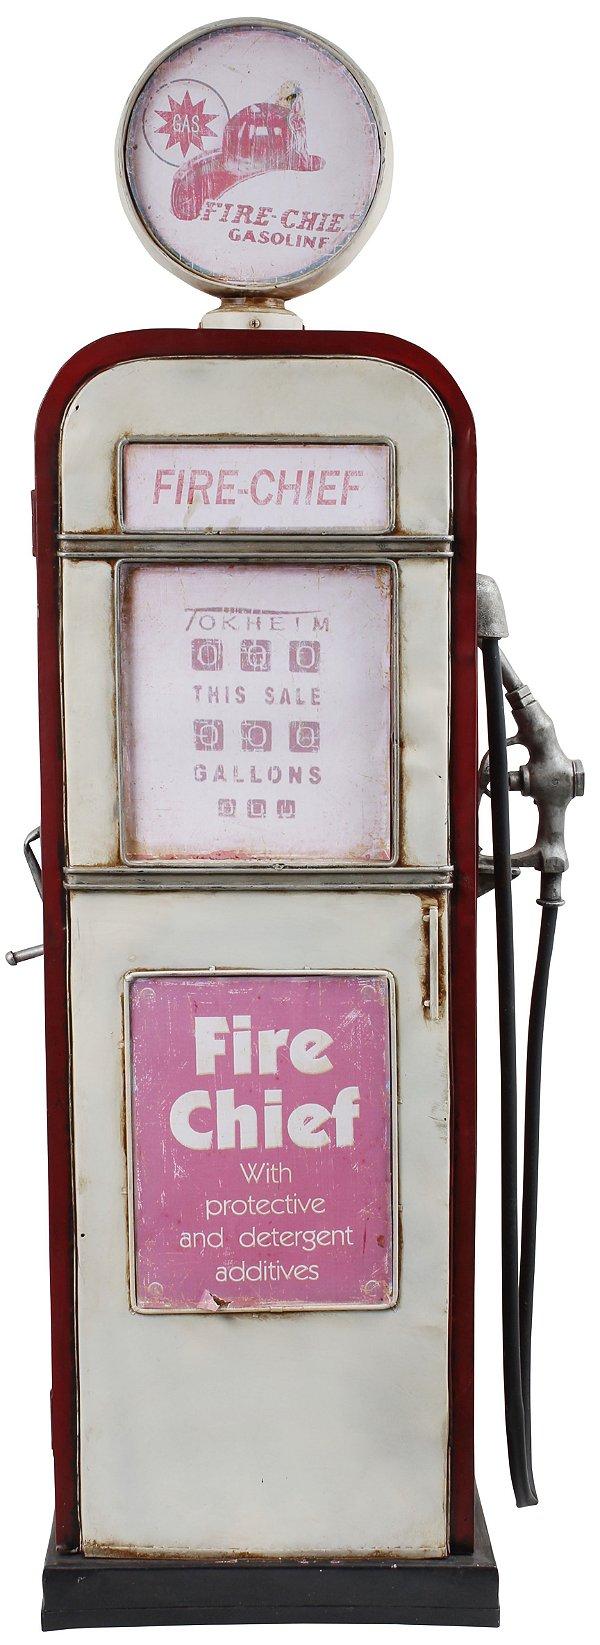 bomba gasolina  oldway 122 x 32 x 27cm